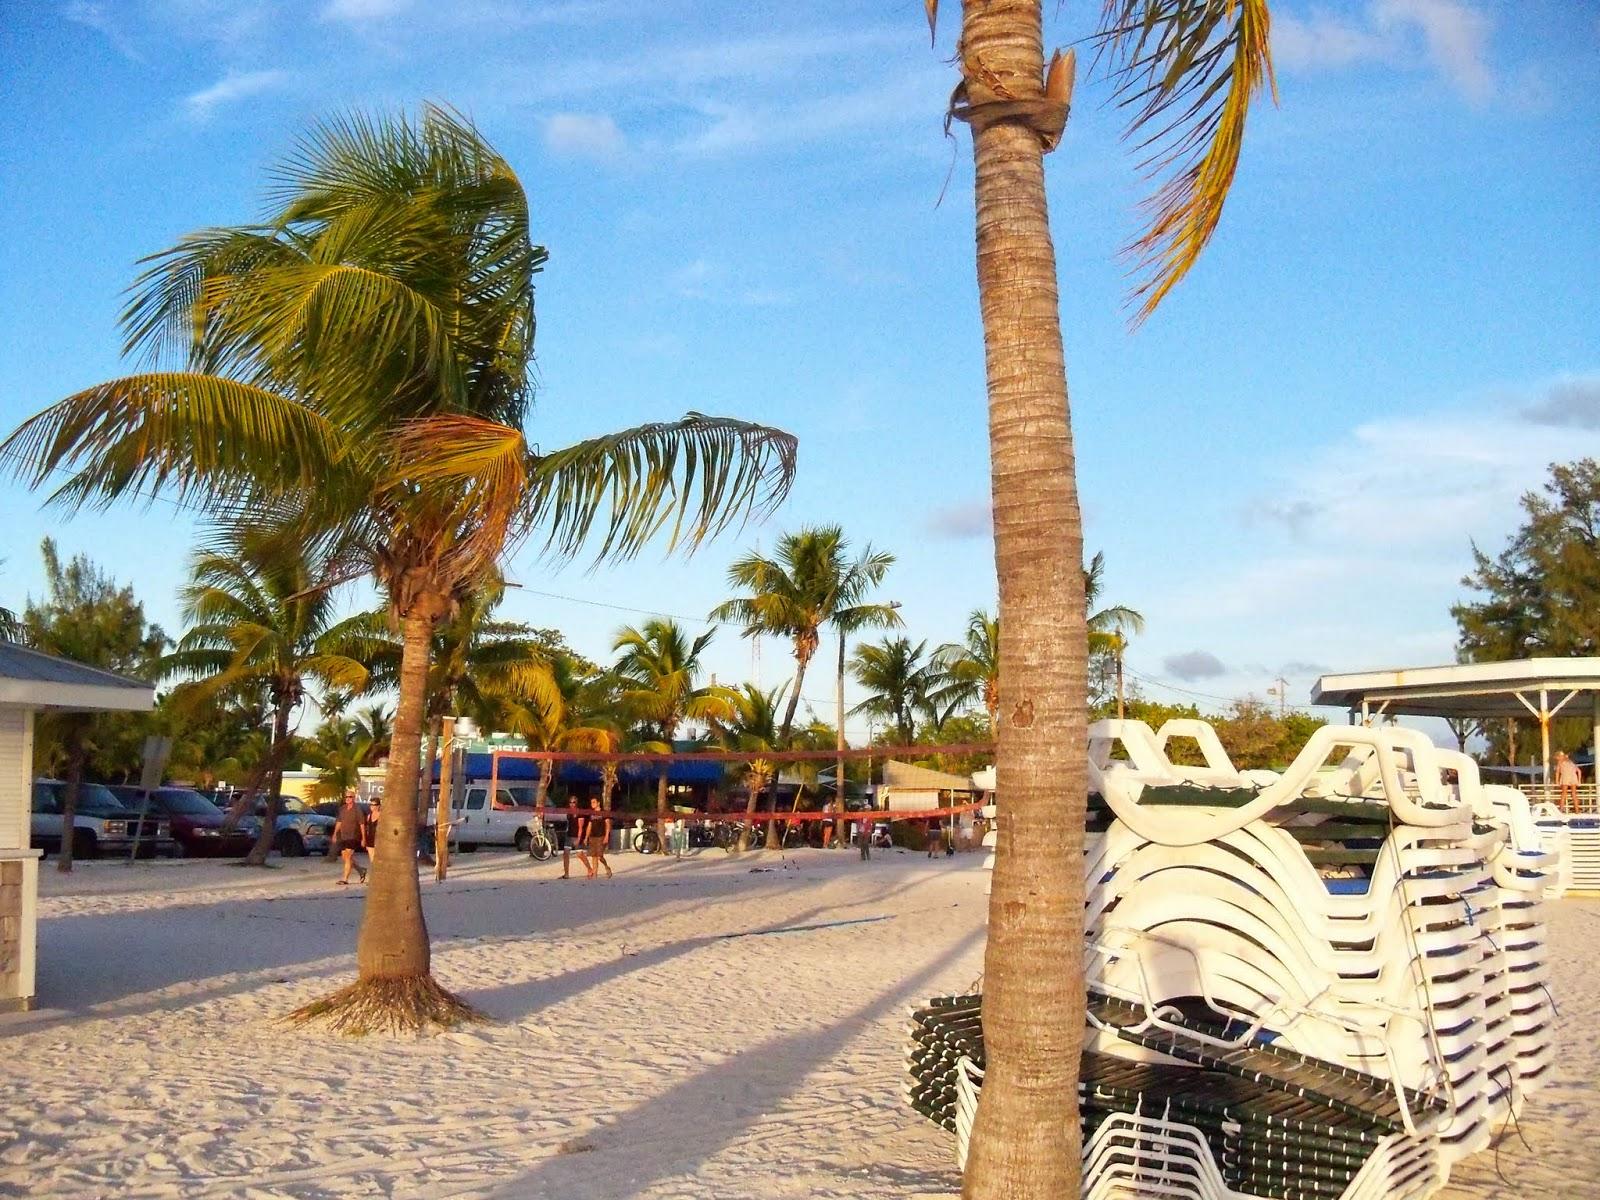 Key West Vacation - 116_5542.JPG